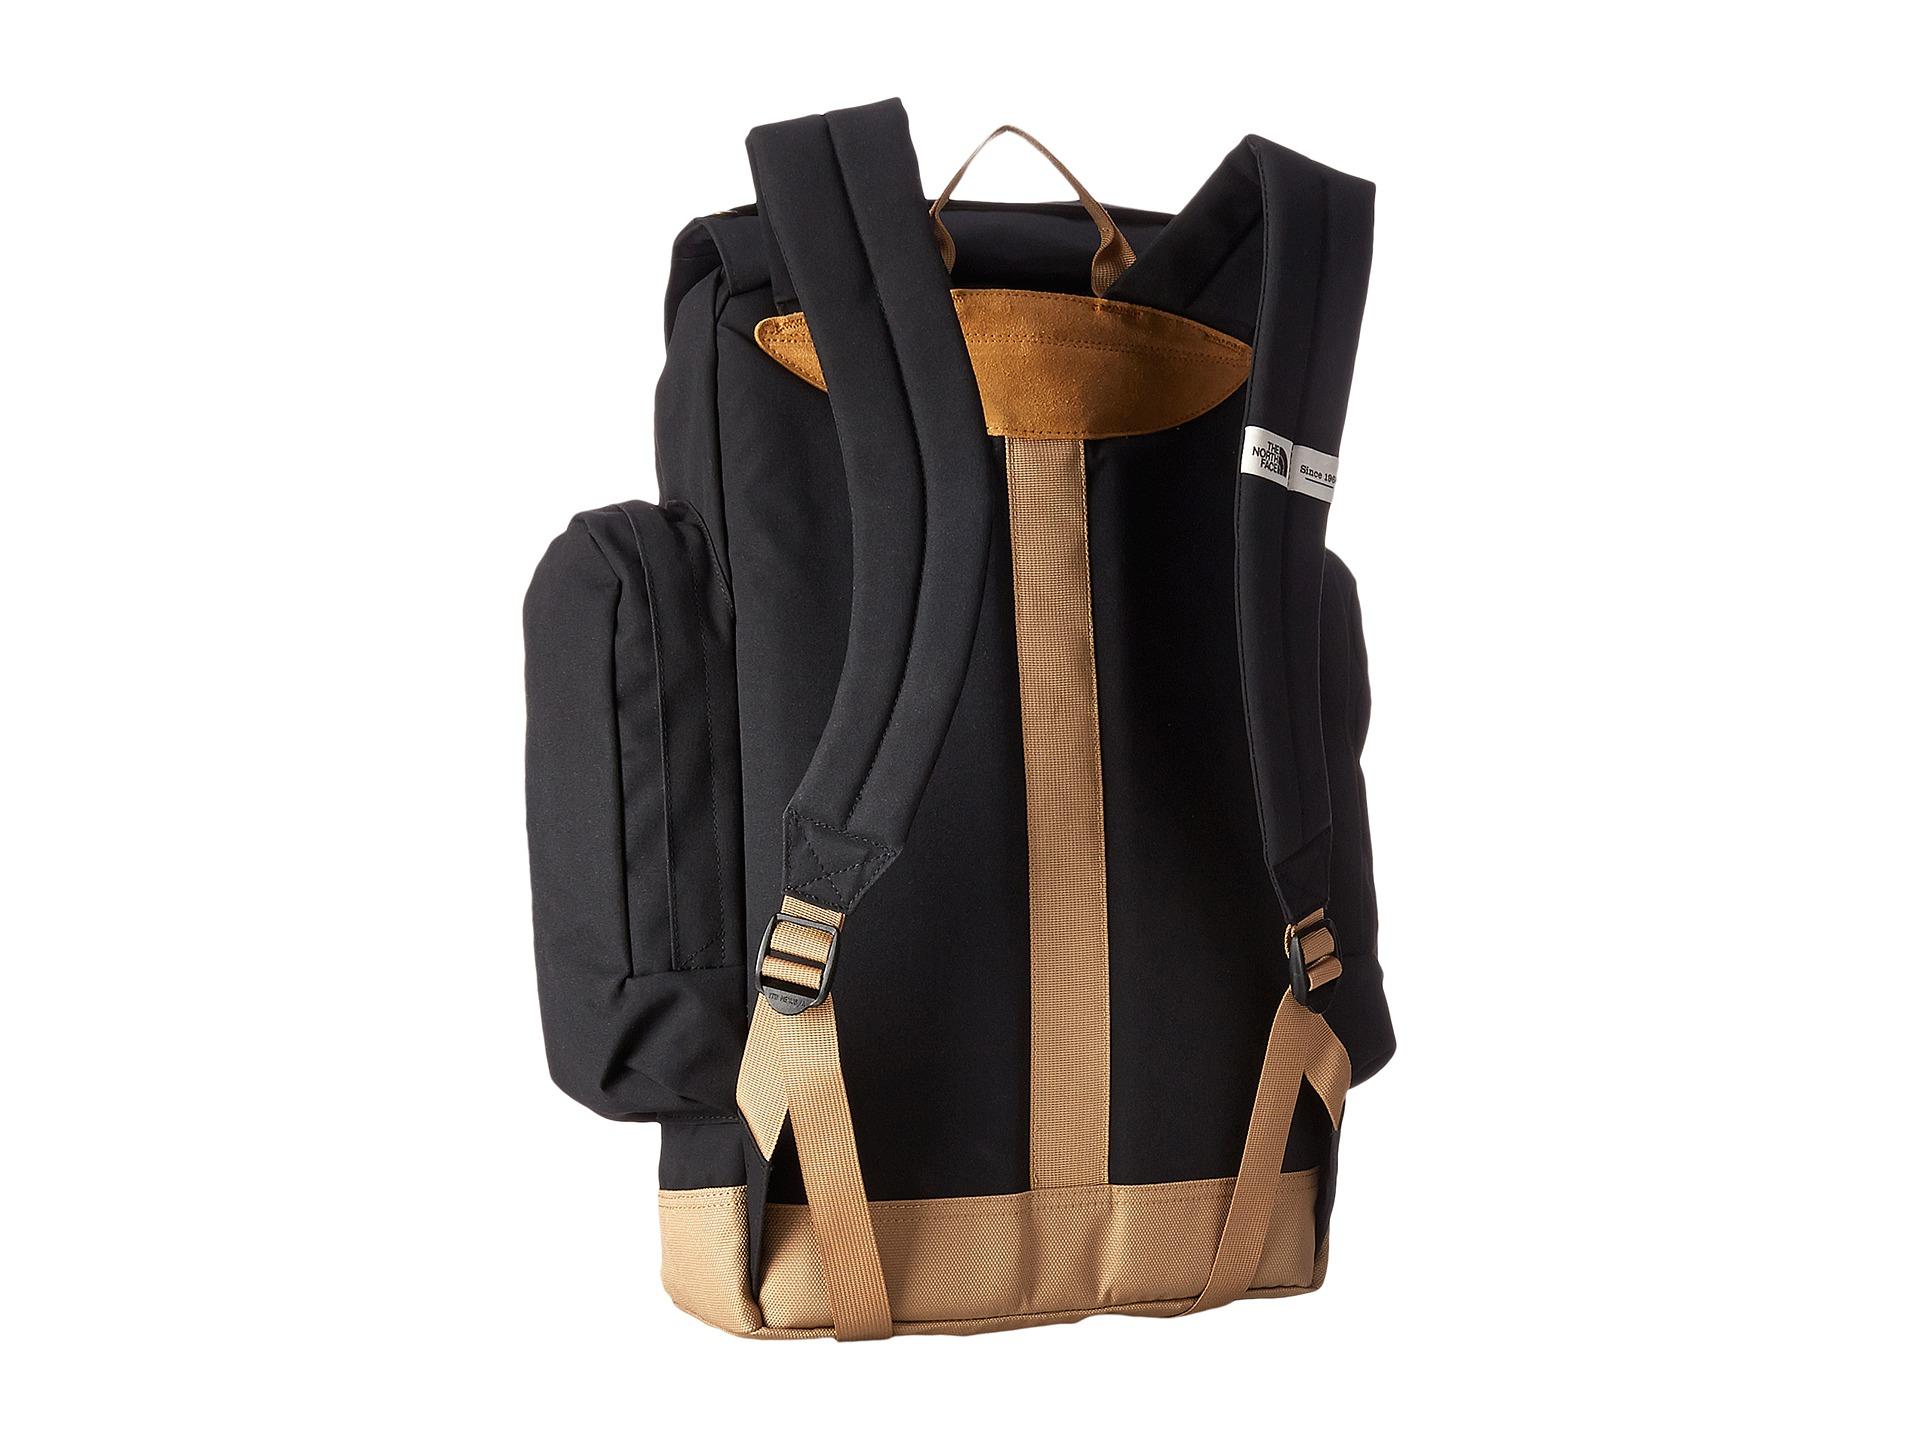 Lyst - The North Face Rucksack in Black for Men 90c2eeb4fa